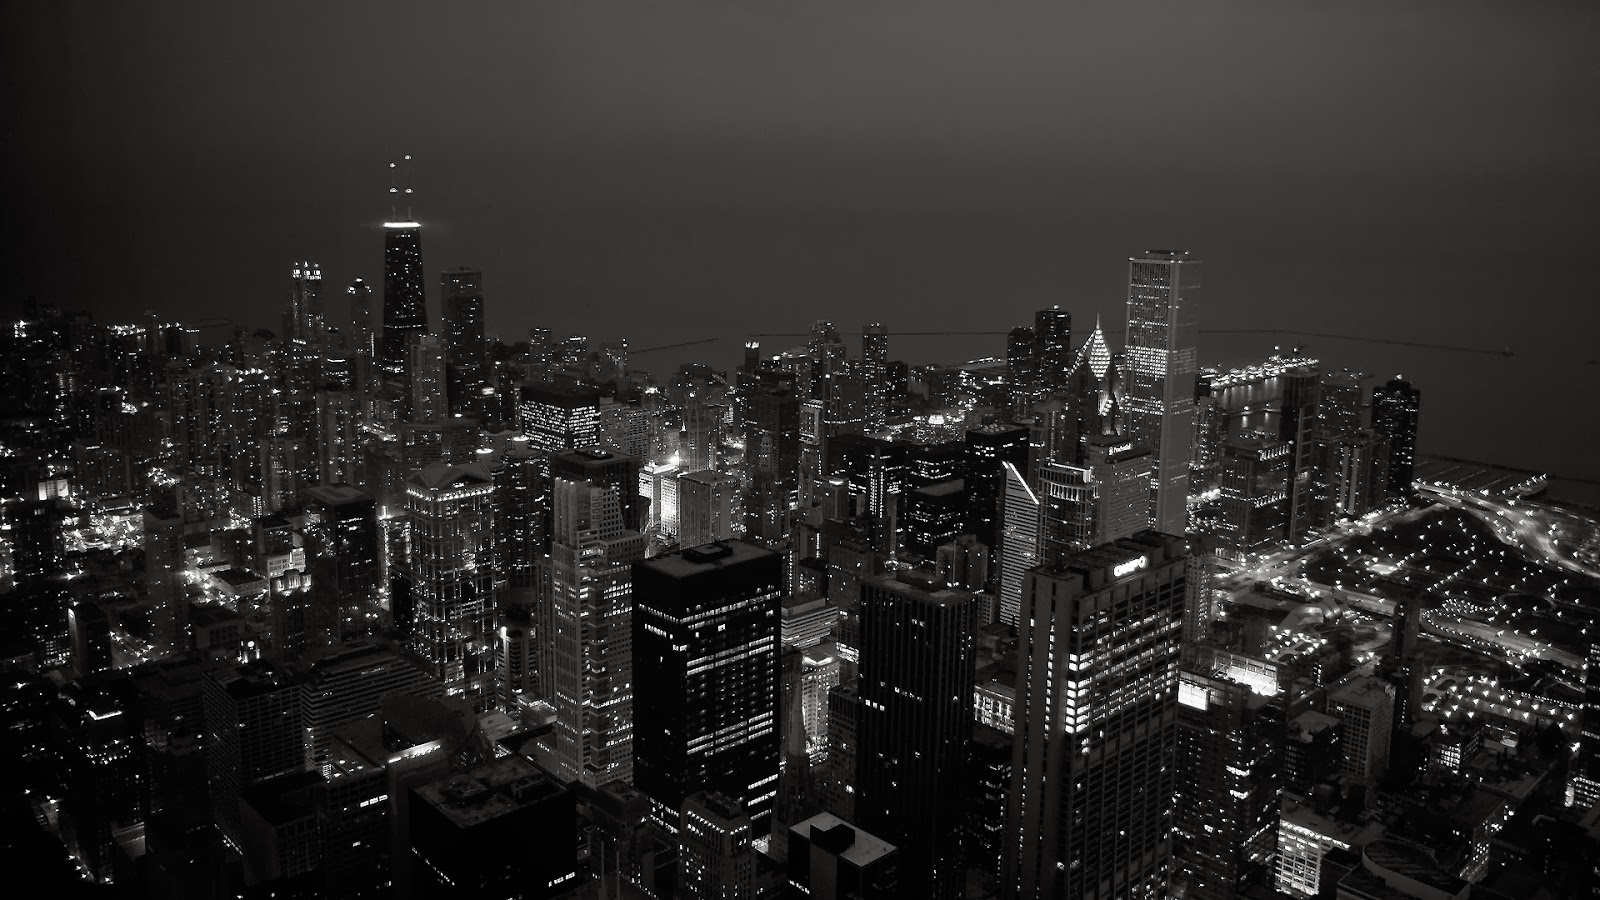 city at night live wallpaper Best Wallpaper Views 1600x900